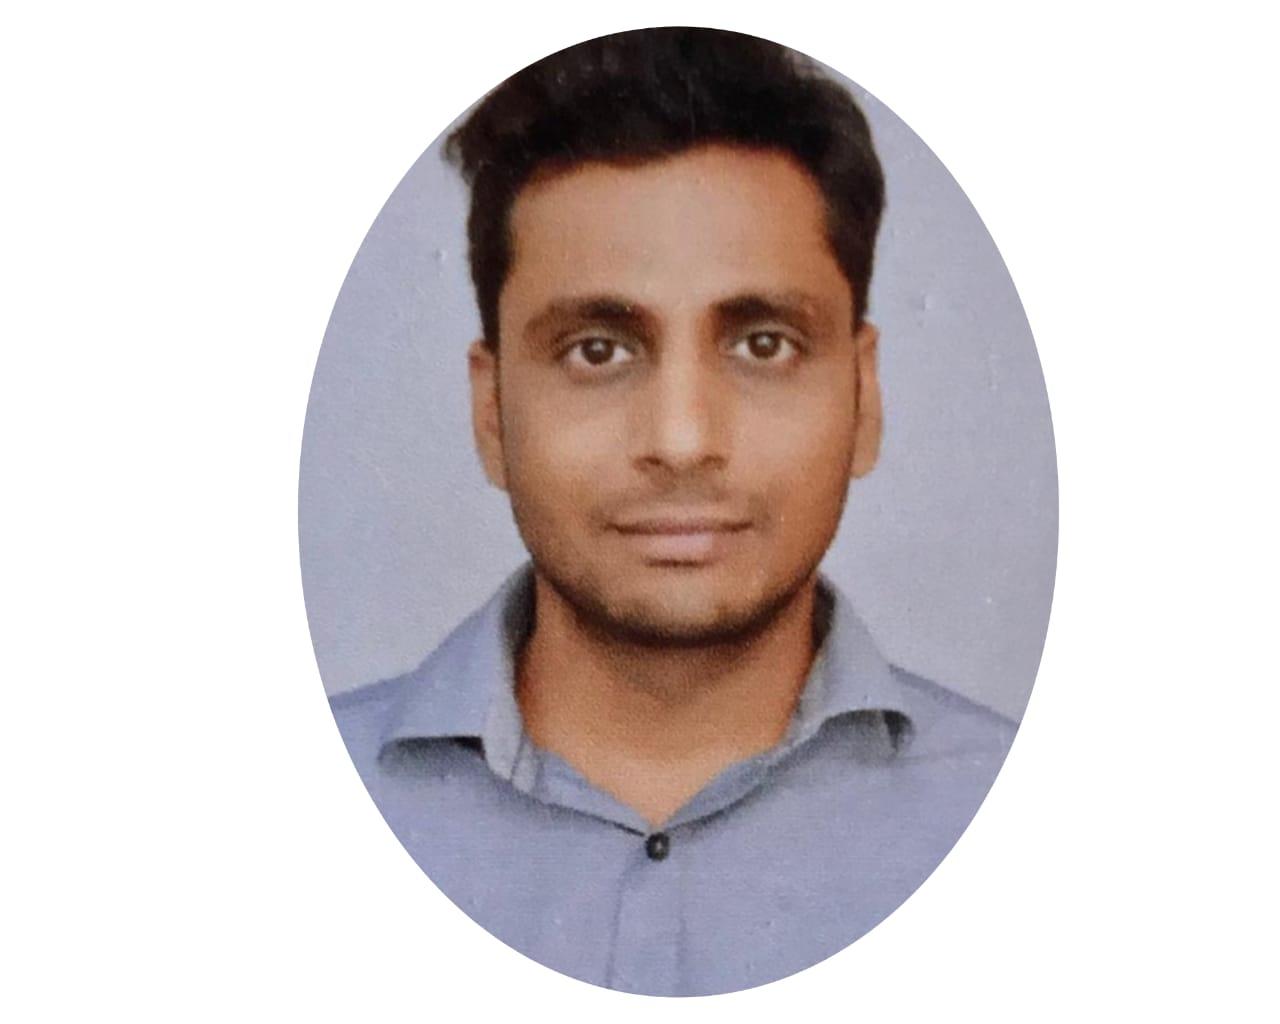 Mr. Ashish Vishwakarma UNISED